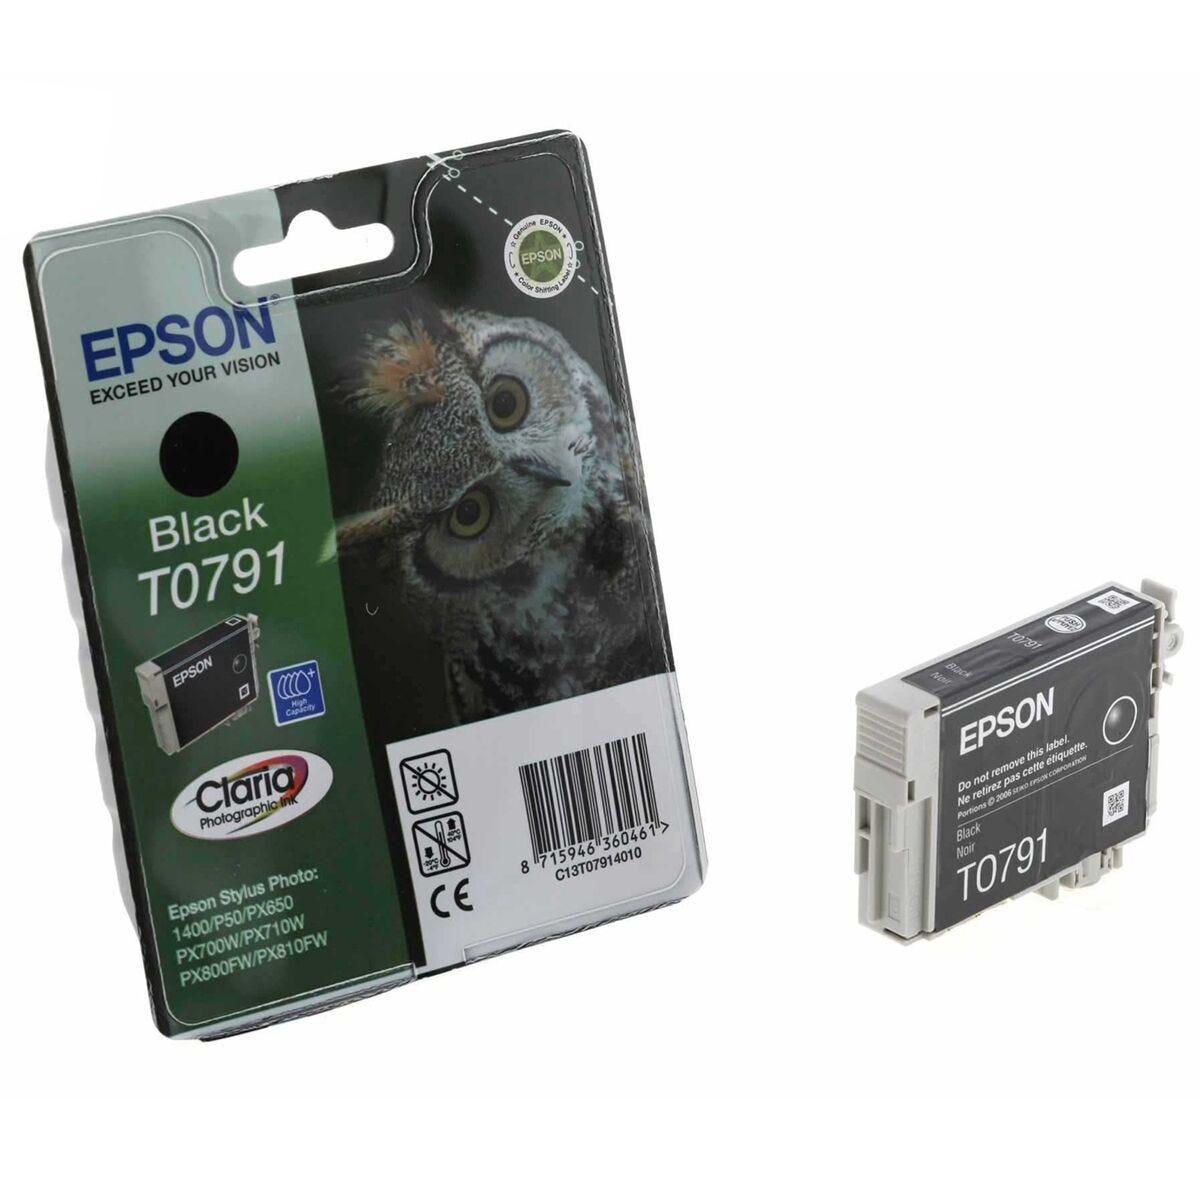 Epson T0791 Ink Cartridge